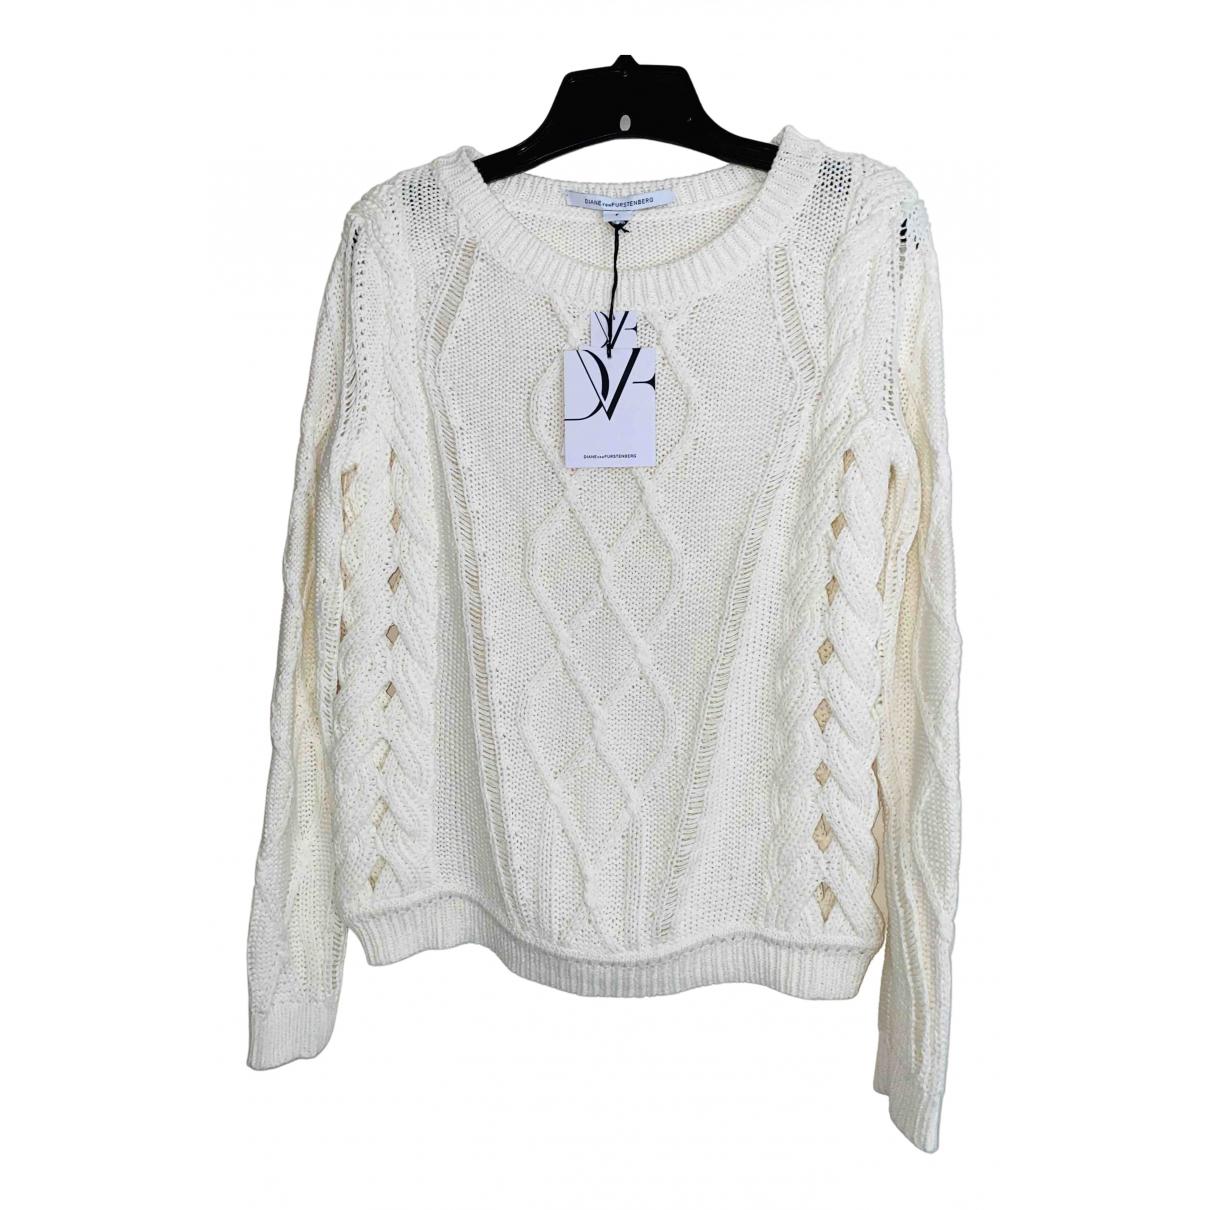 Diane Von Furstenberg - Pull   pour femme en coton - blanc